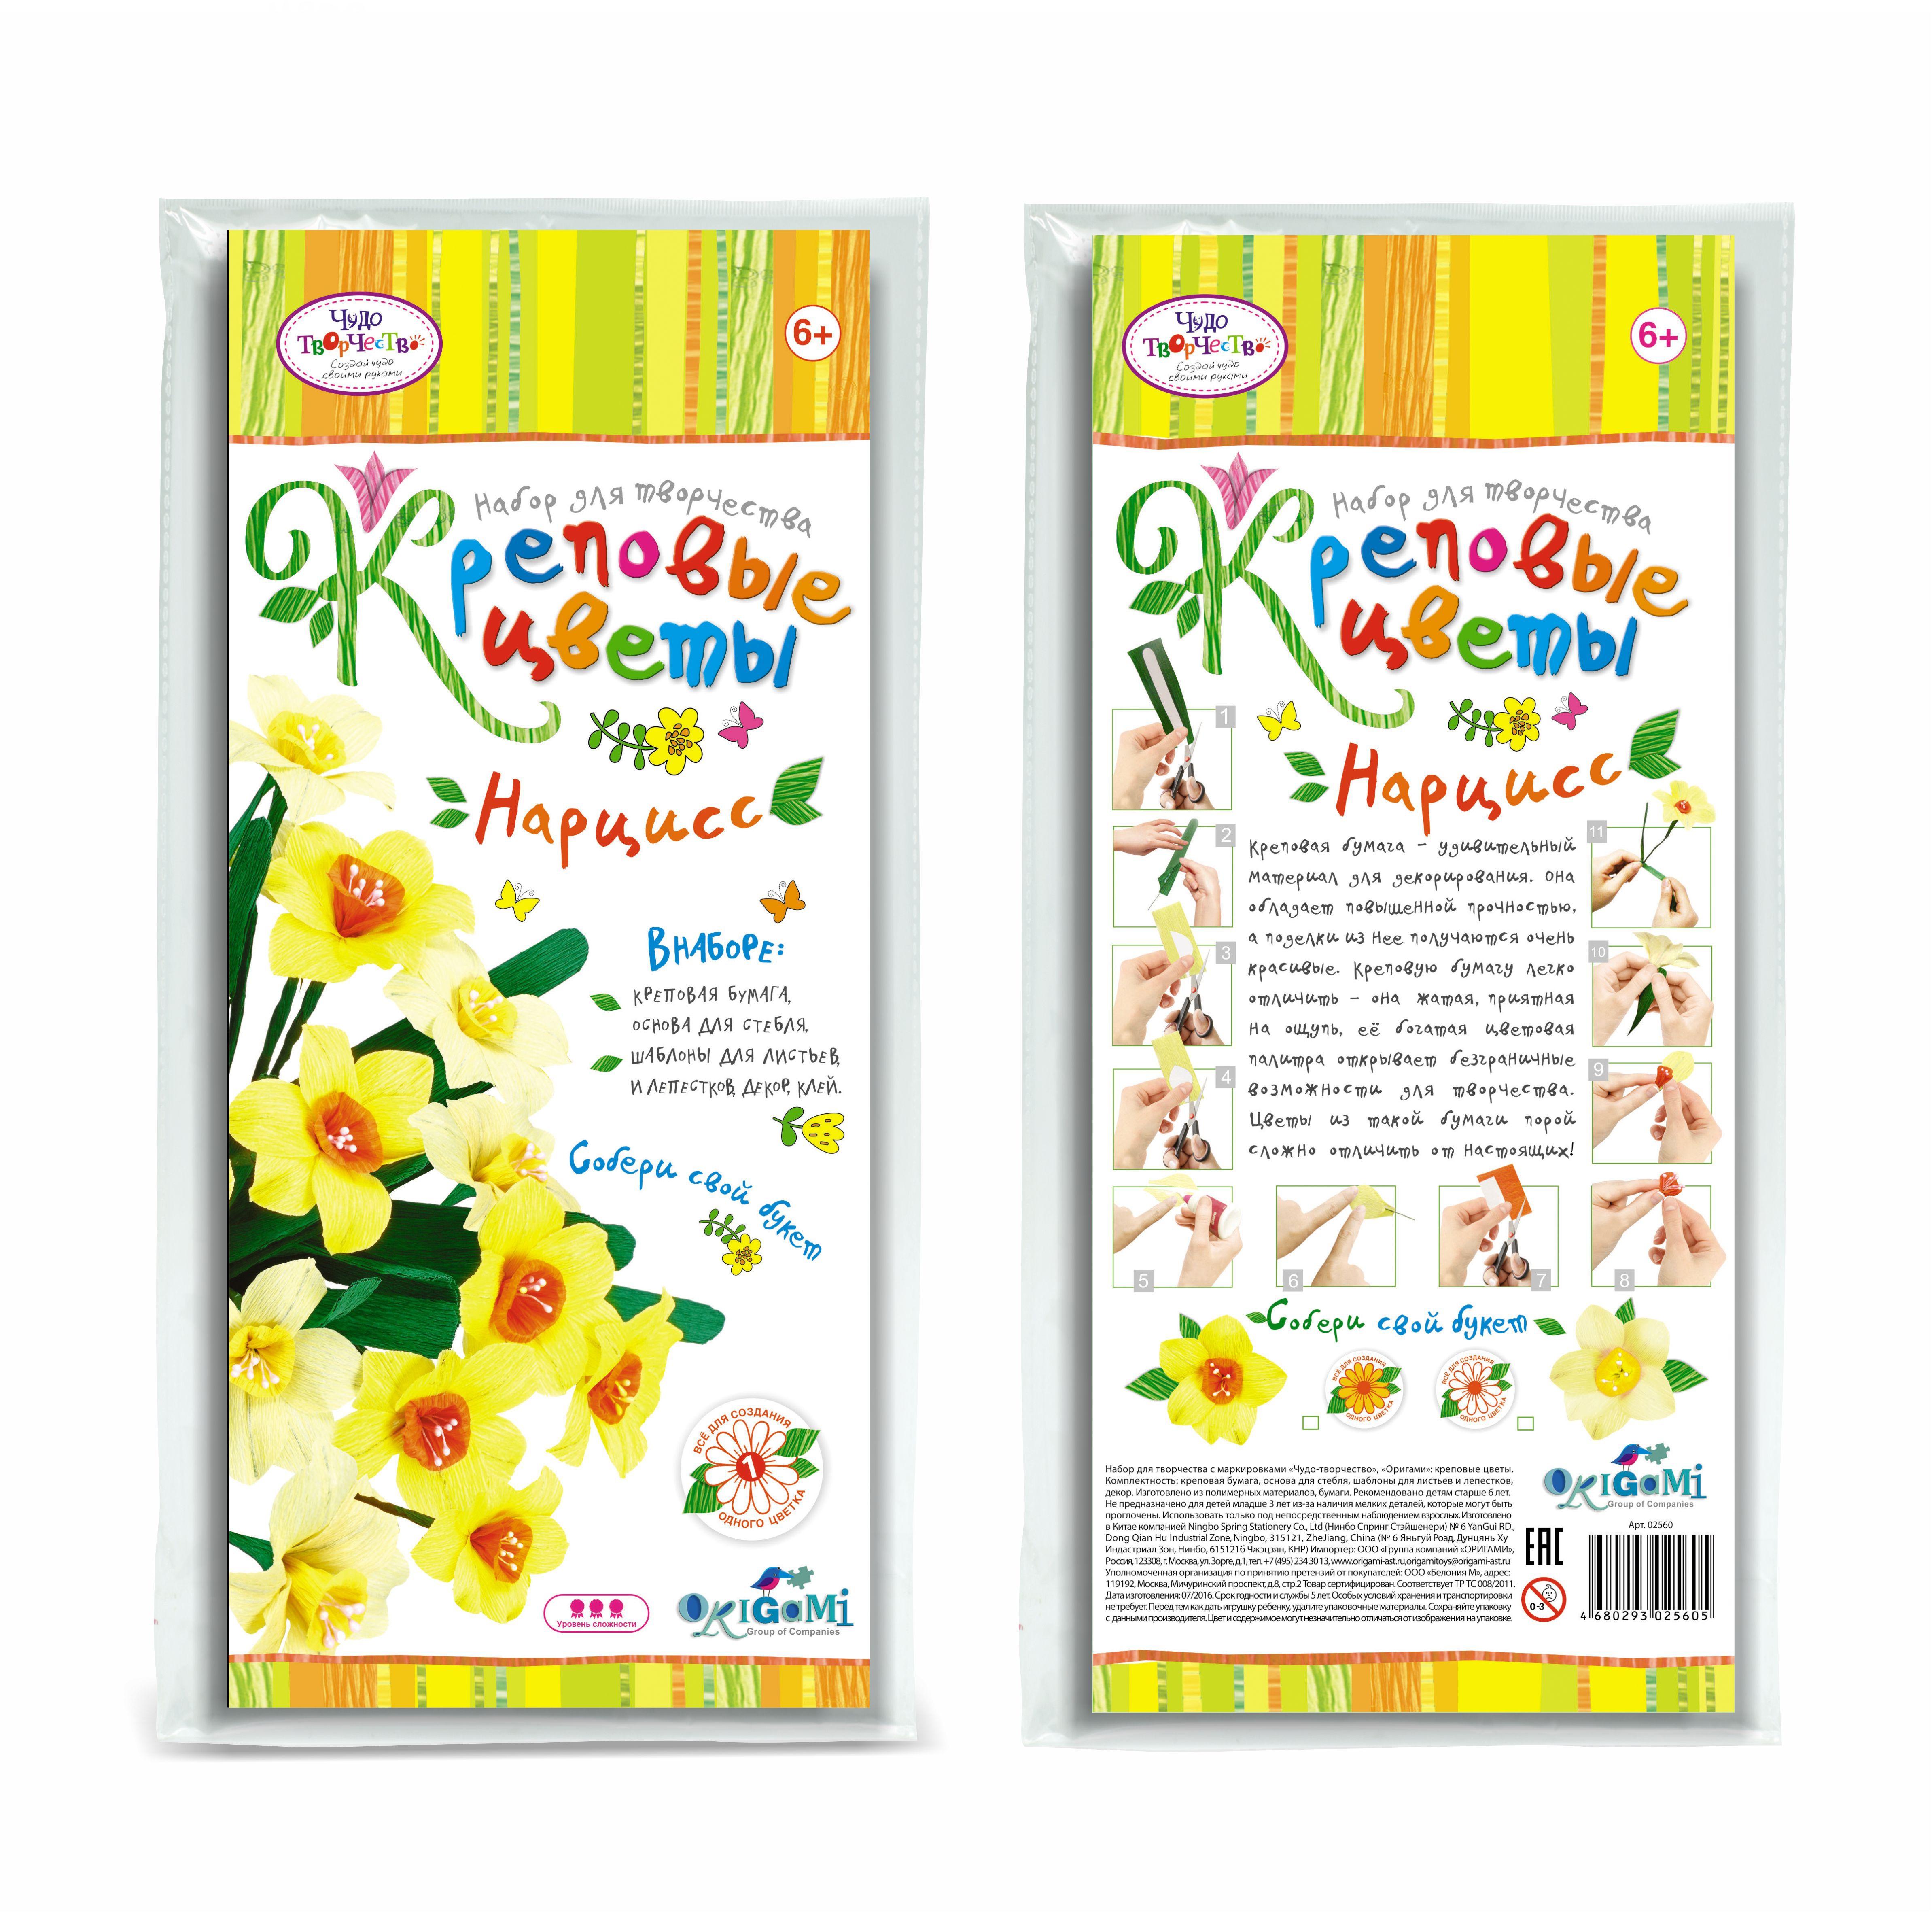 Наборы для творчества Origami Креповые цветы Нарцисc seicane 8 core android 8 0 9 1din car radio gps navi for bmw 3 series e46 m3 316i 318i 320i 323i 325i with wifi bluetooth 32g